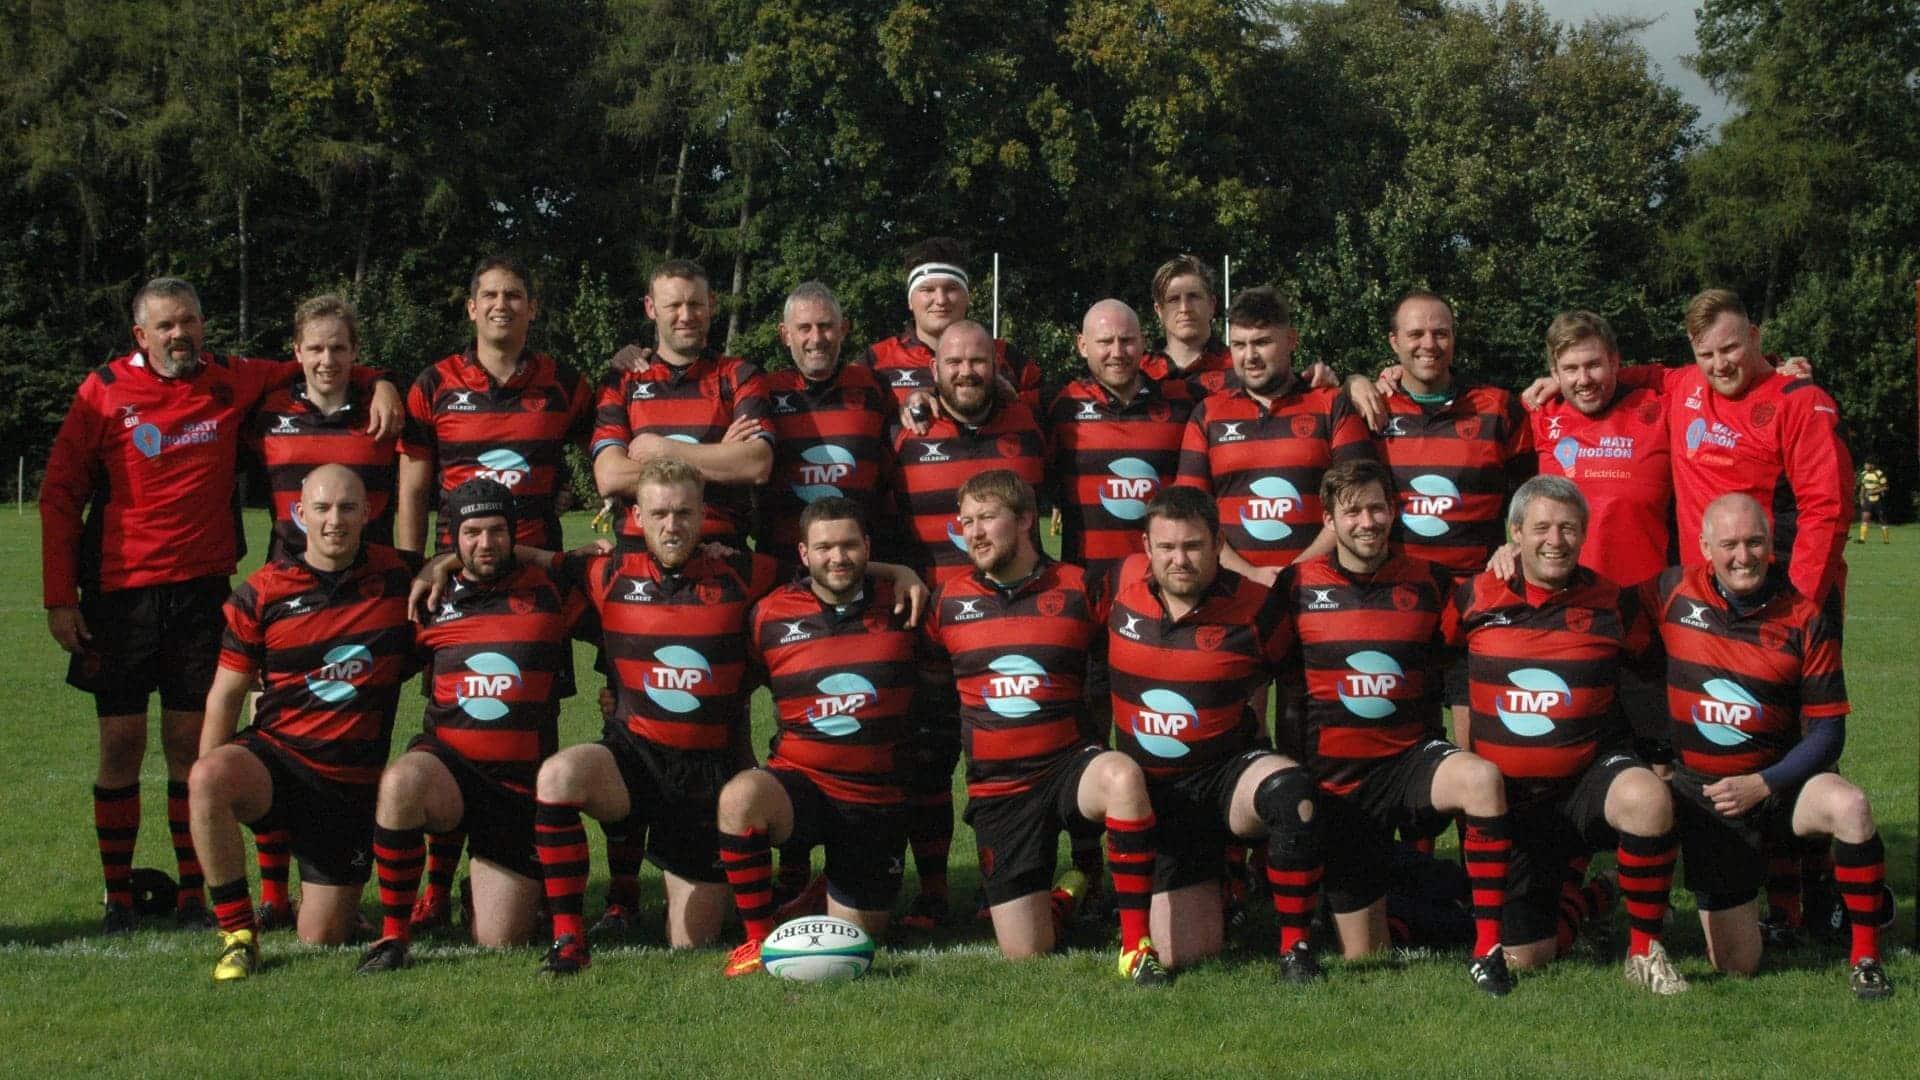 Sponsor Steyning RFC